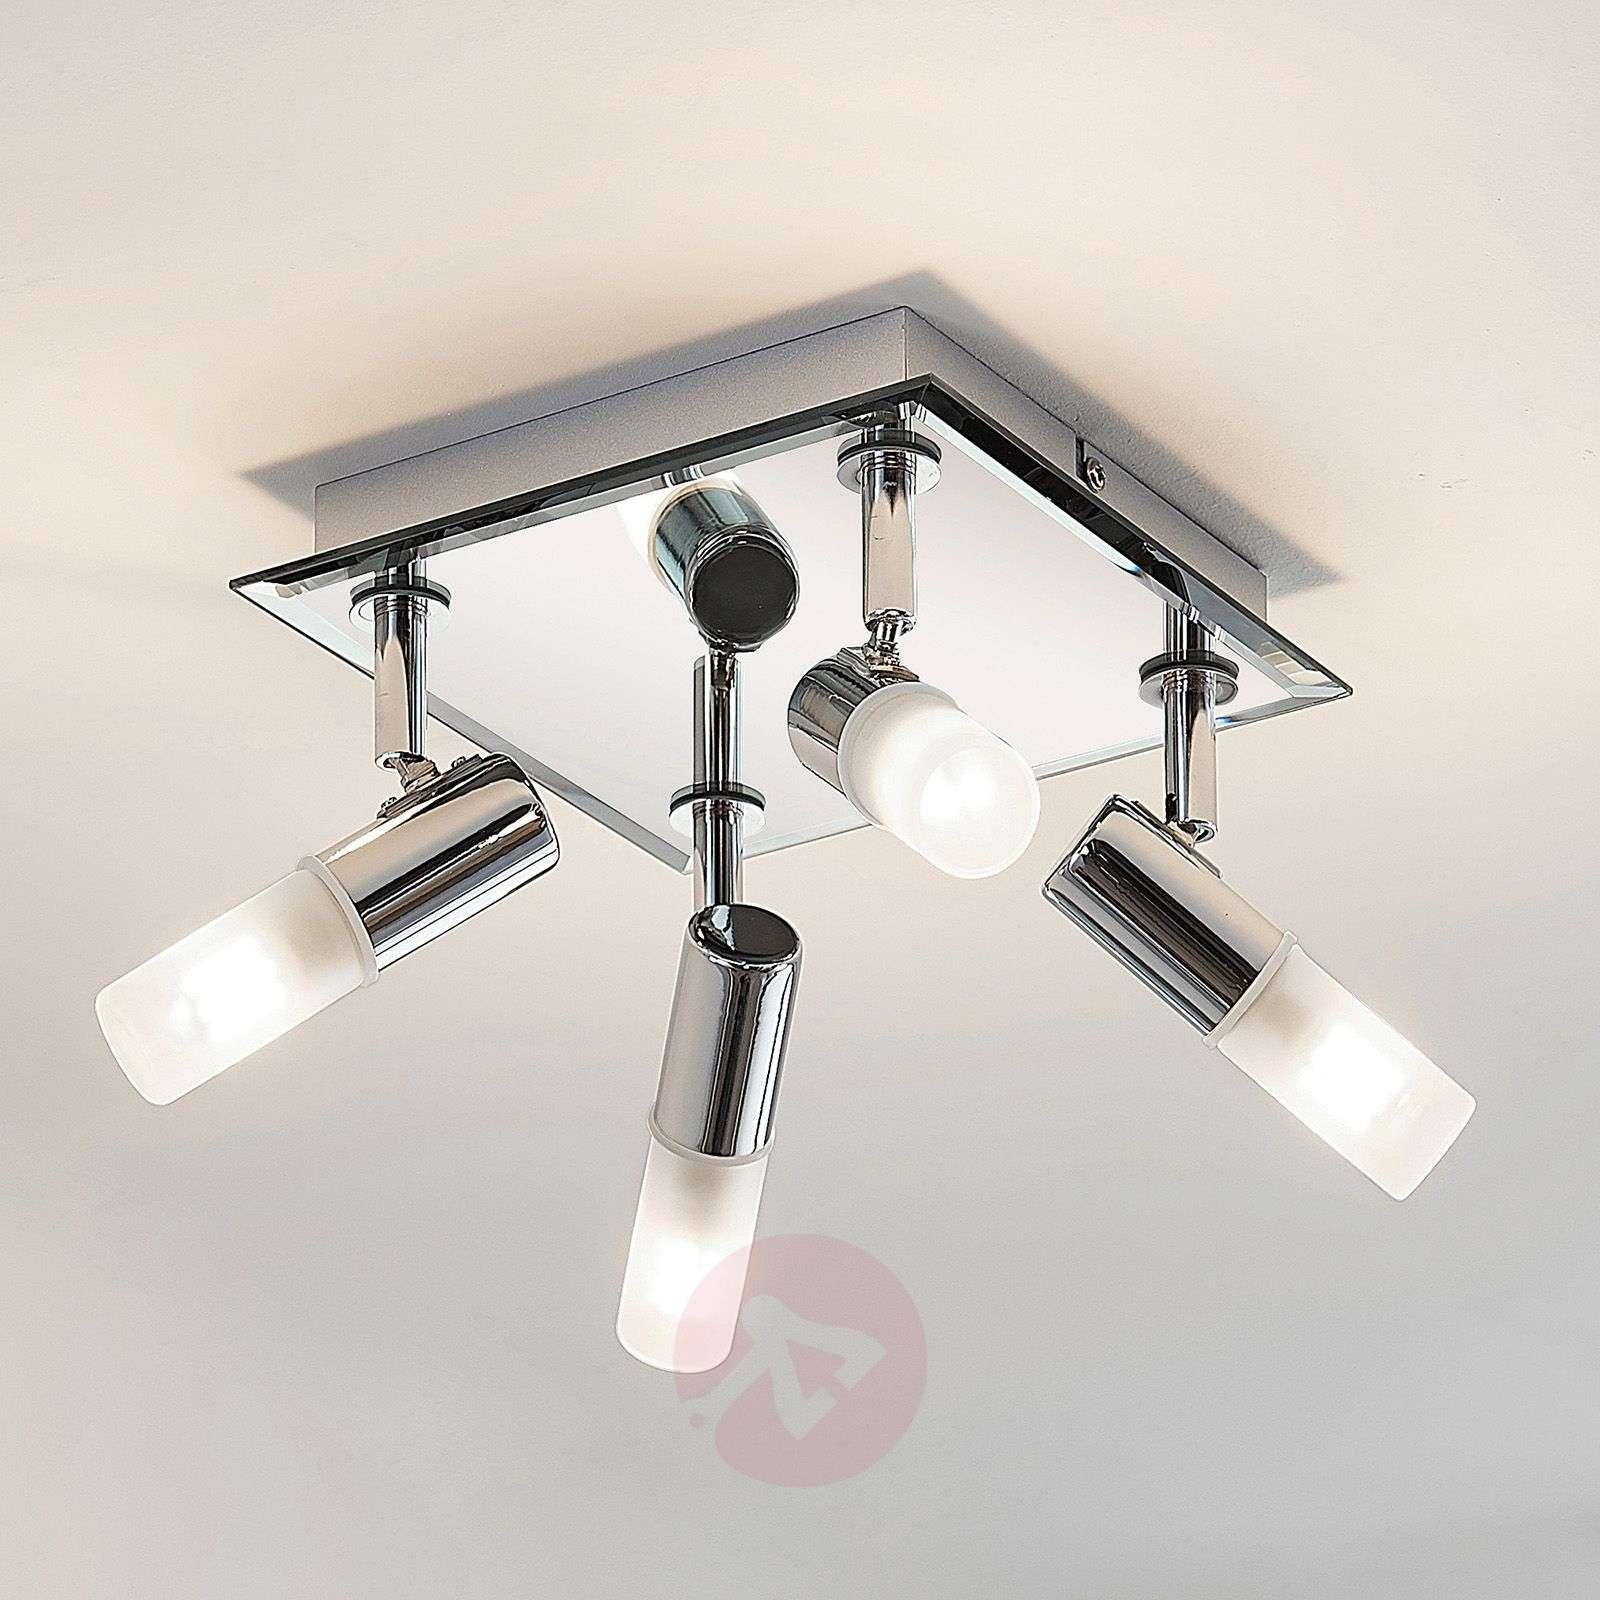 Kylpyhuoneen kattolamppu Zela, 4-lampp. 32x32cm-9624386-02